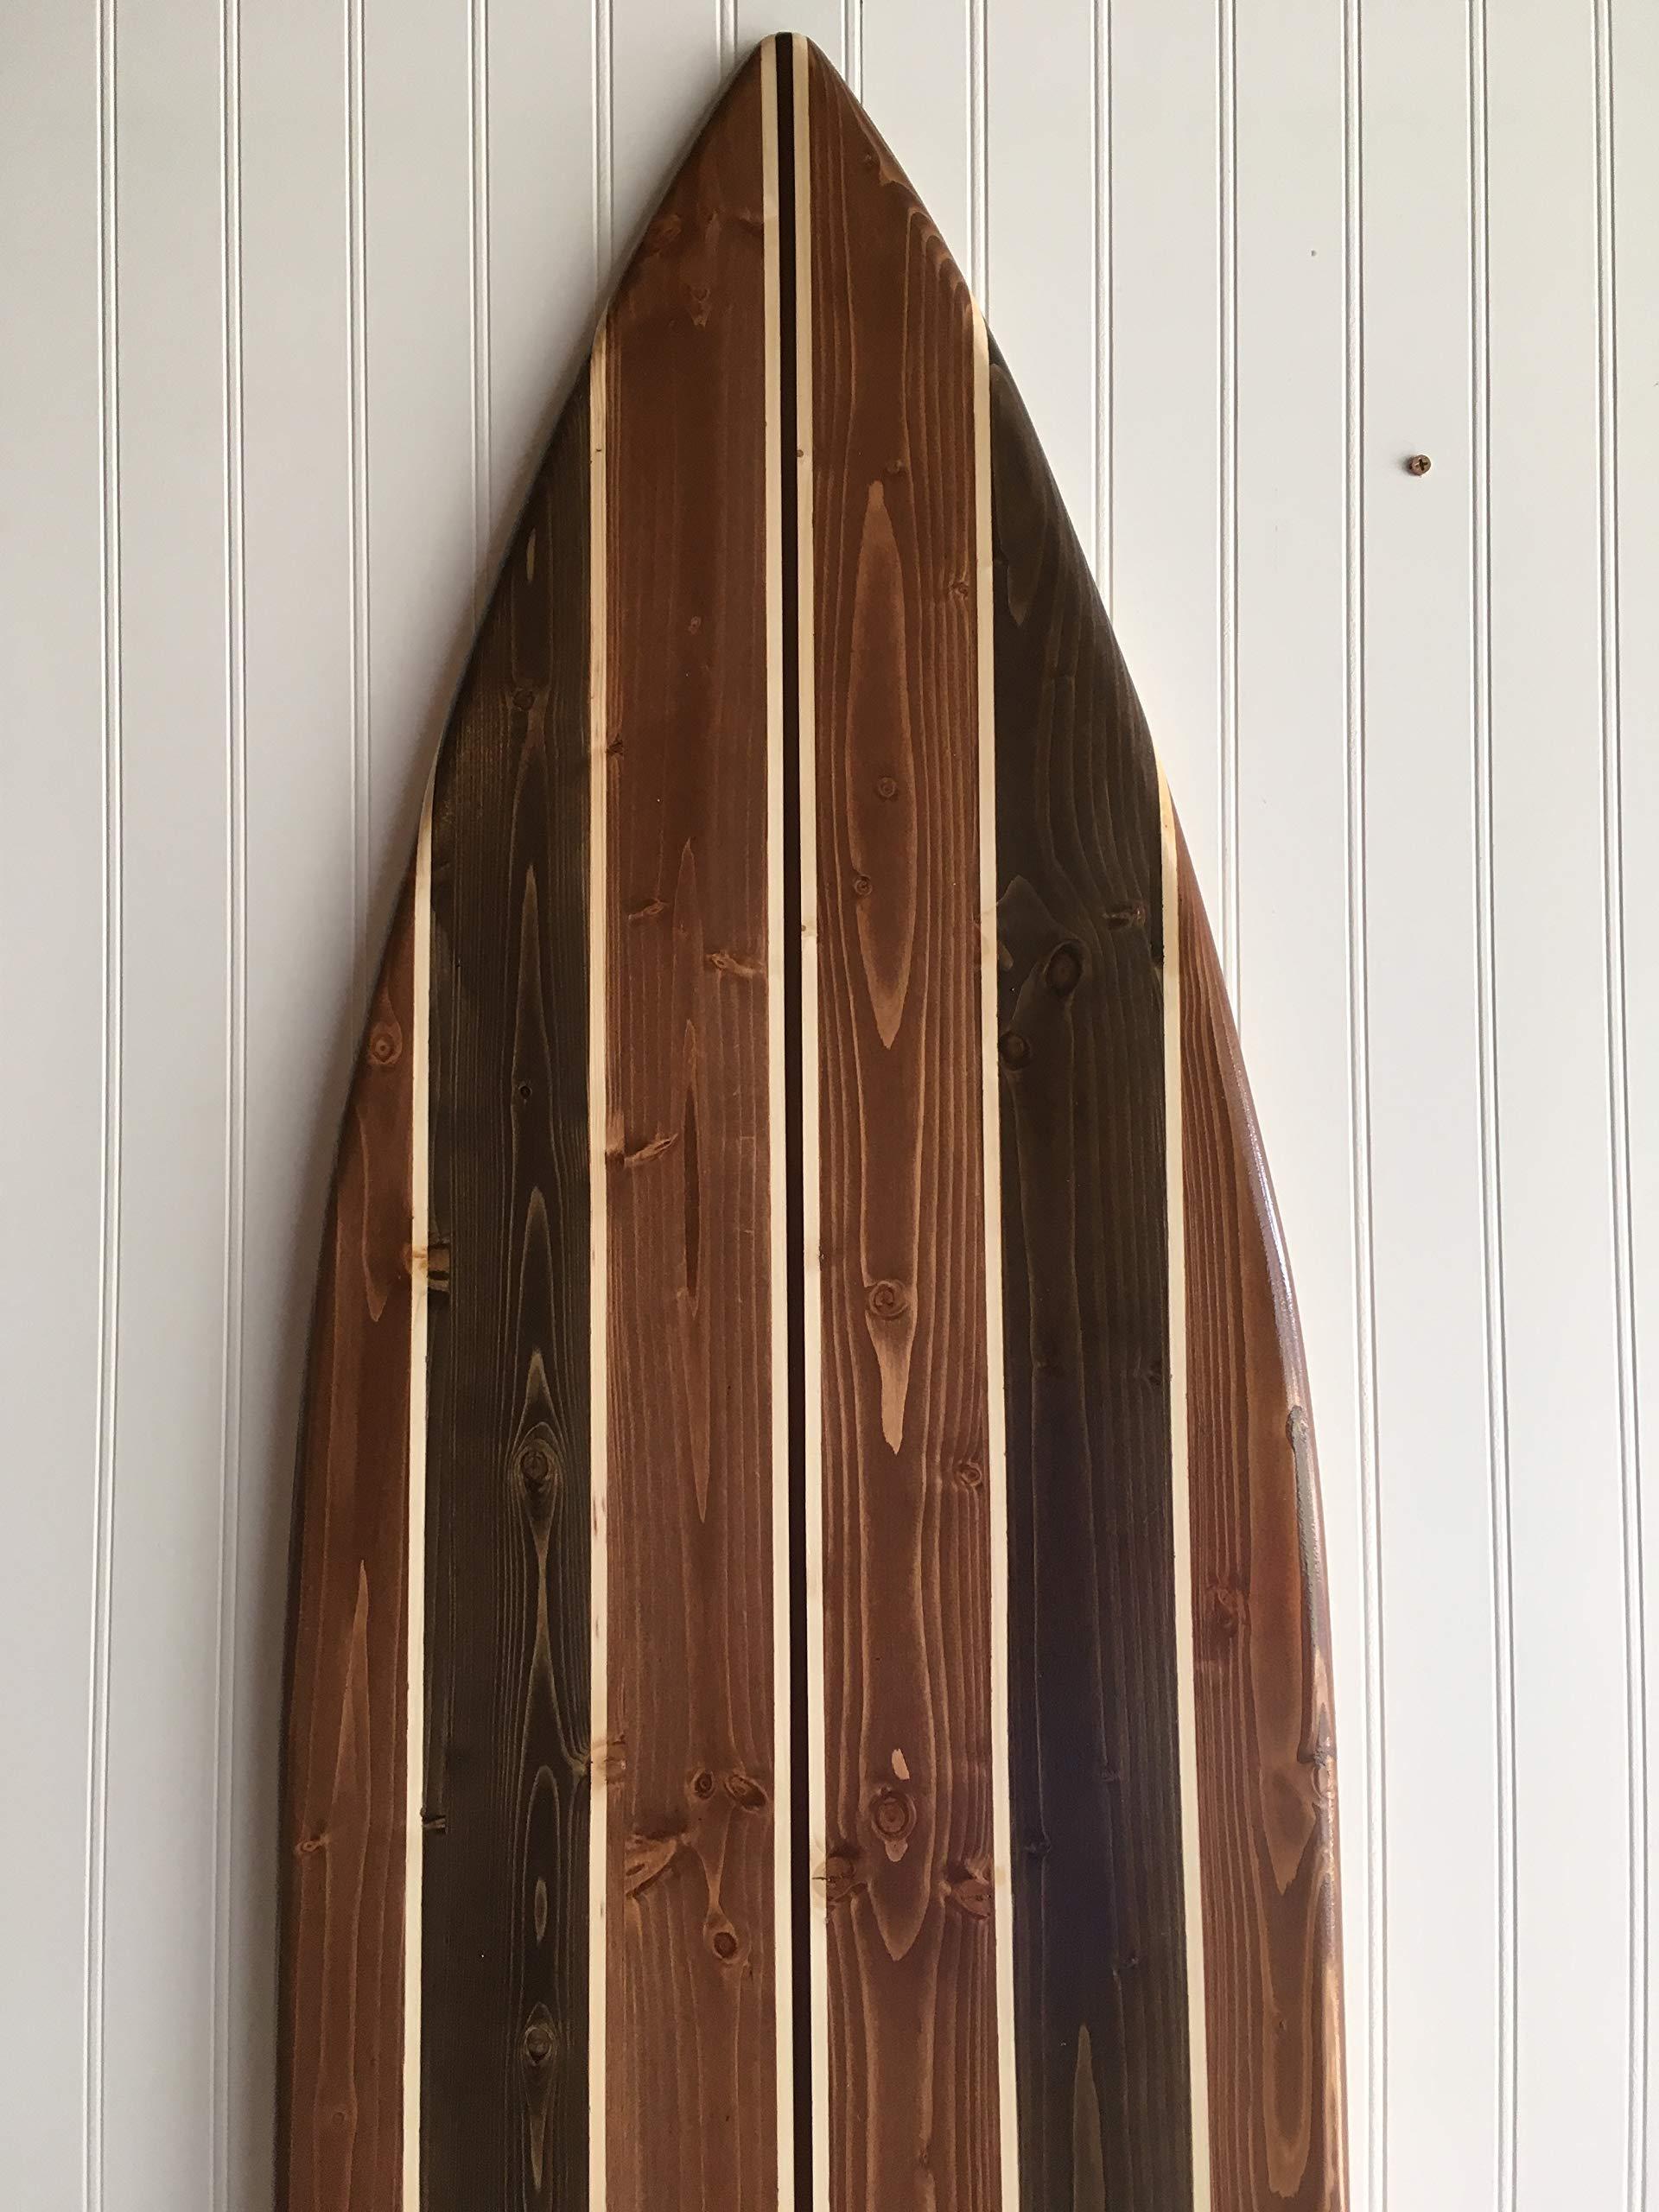 6 foot wood surfboard wall art vintage design